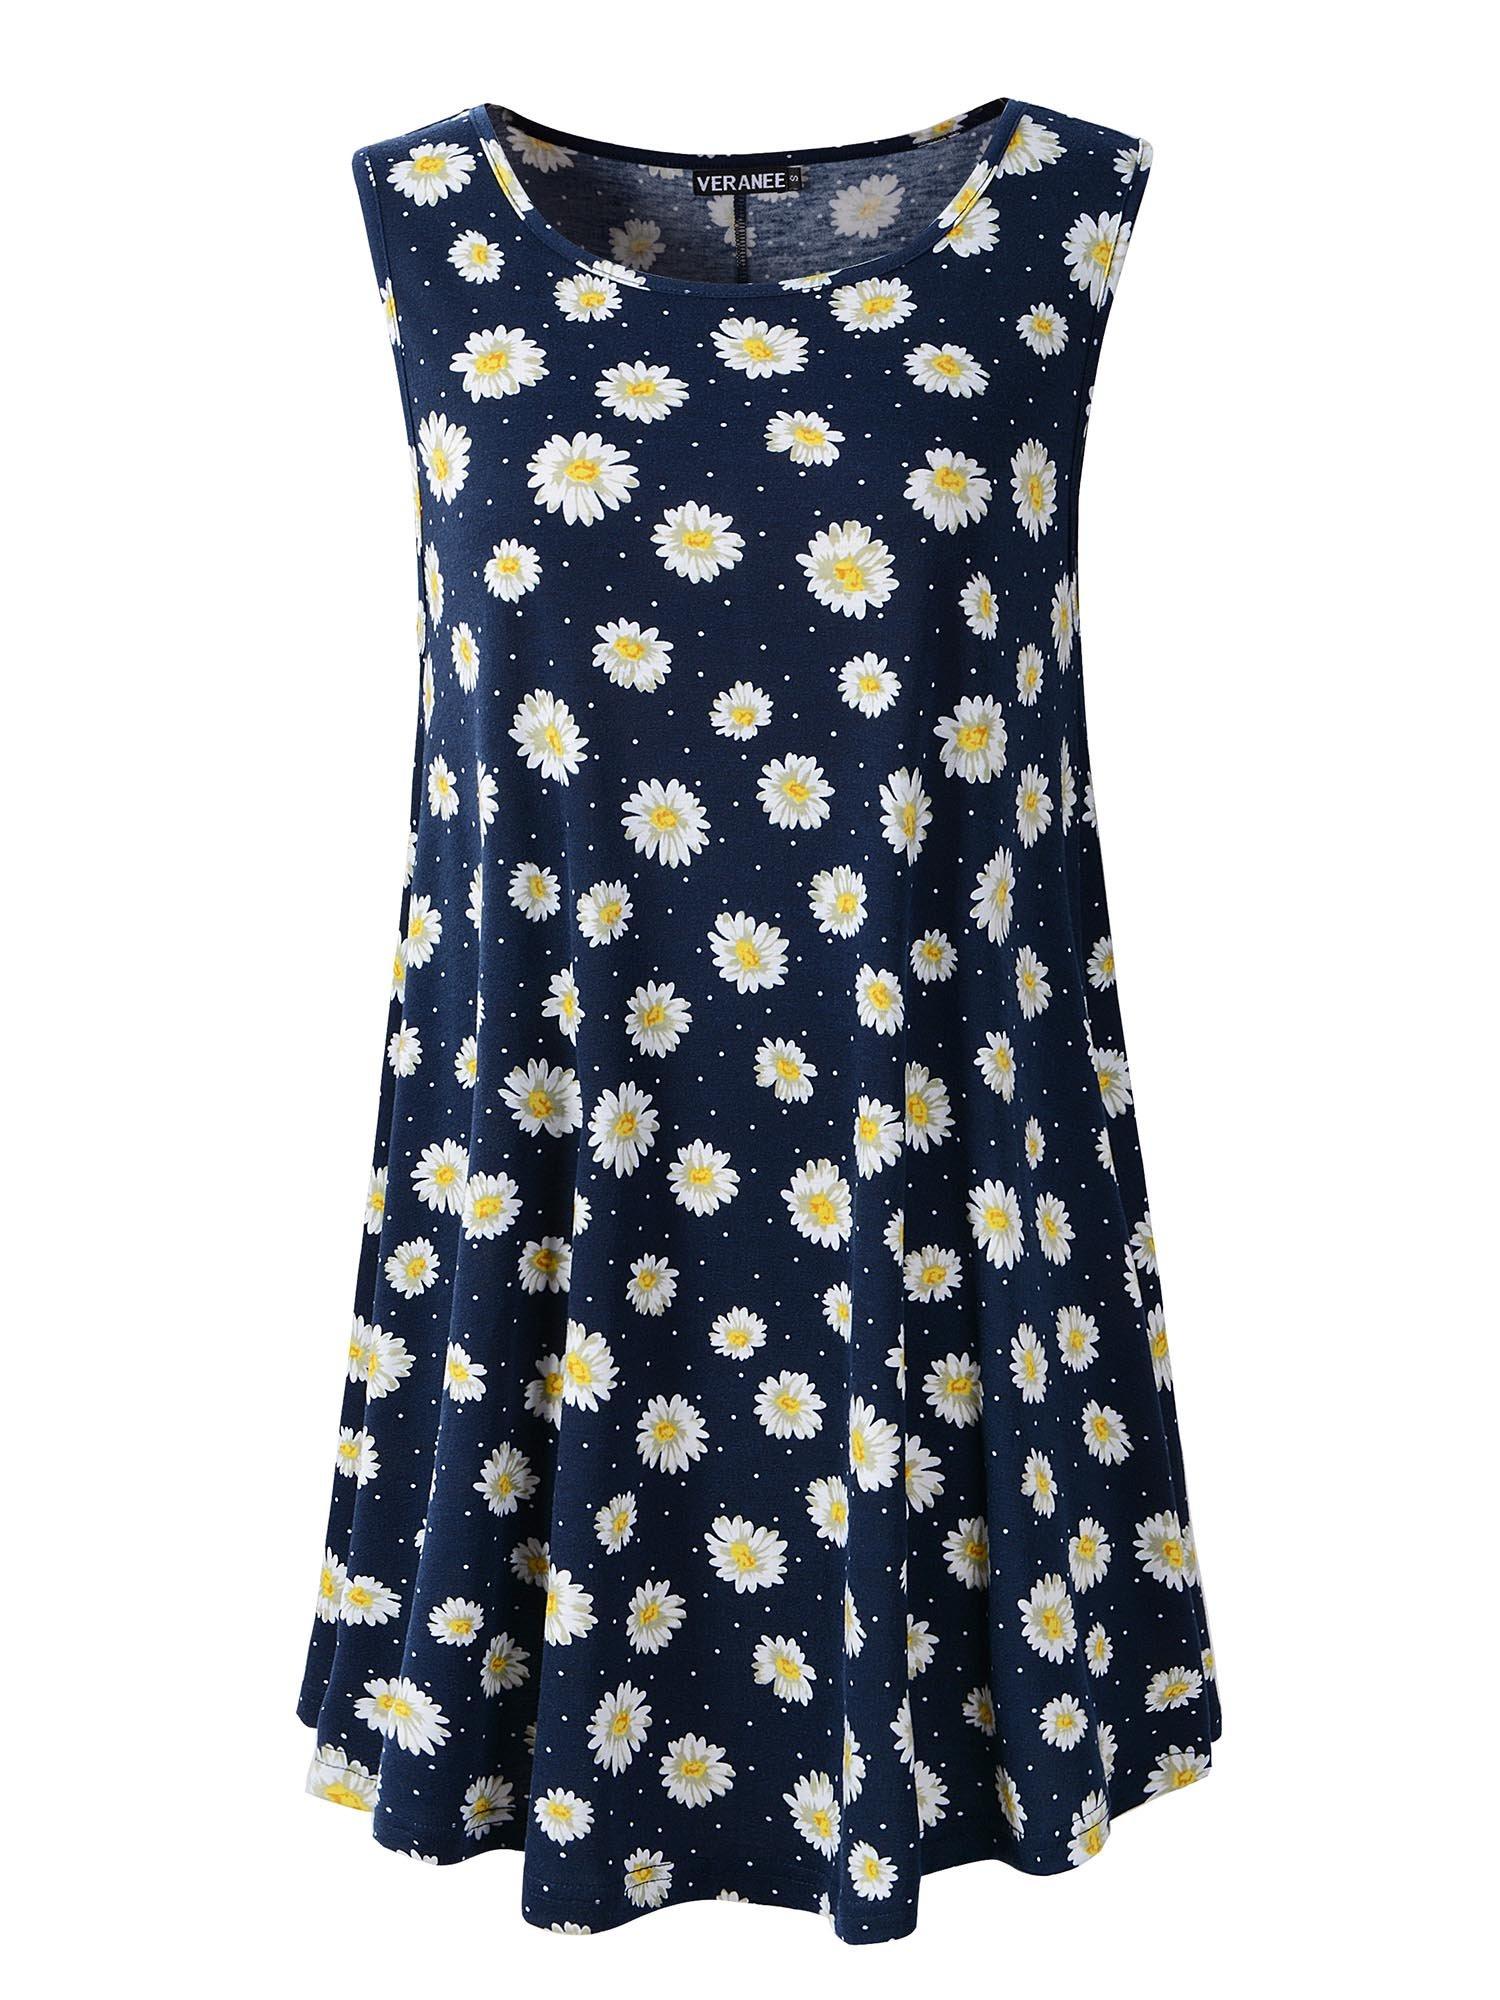 Veranee Women's Sleeveless Swing Tunic Summer Floral Flare Tank Top (M, 6-6)